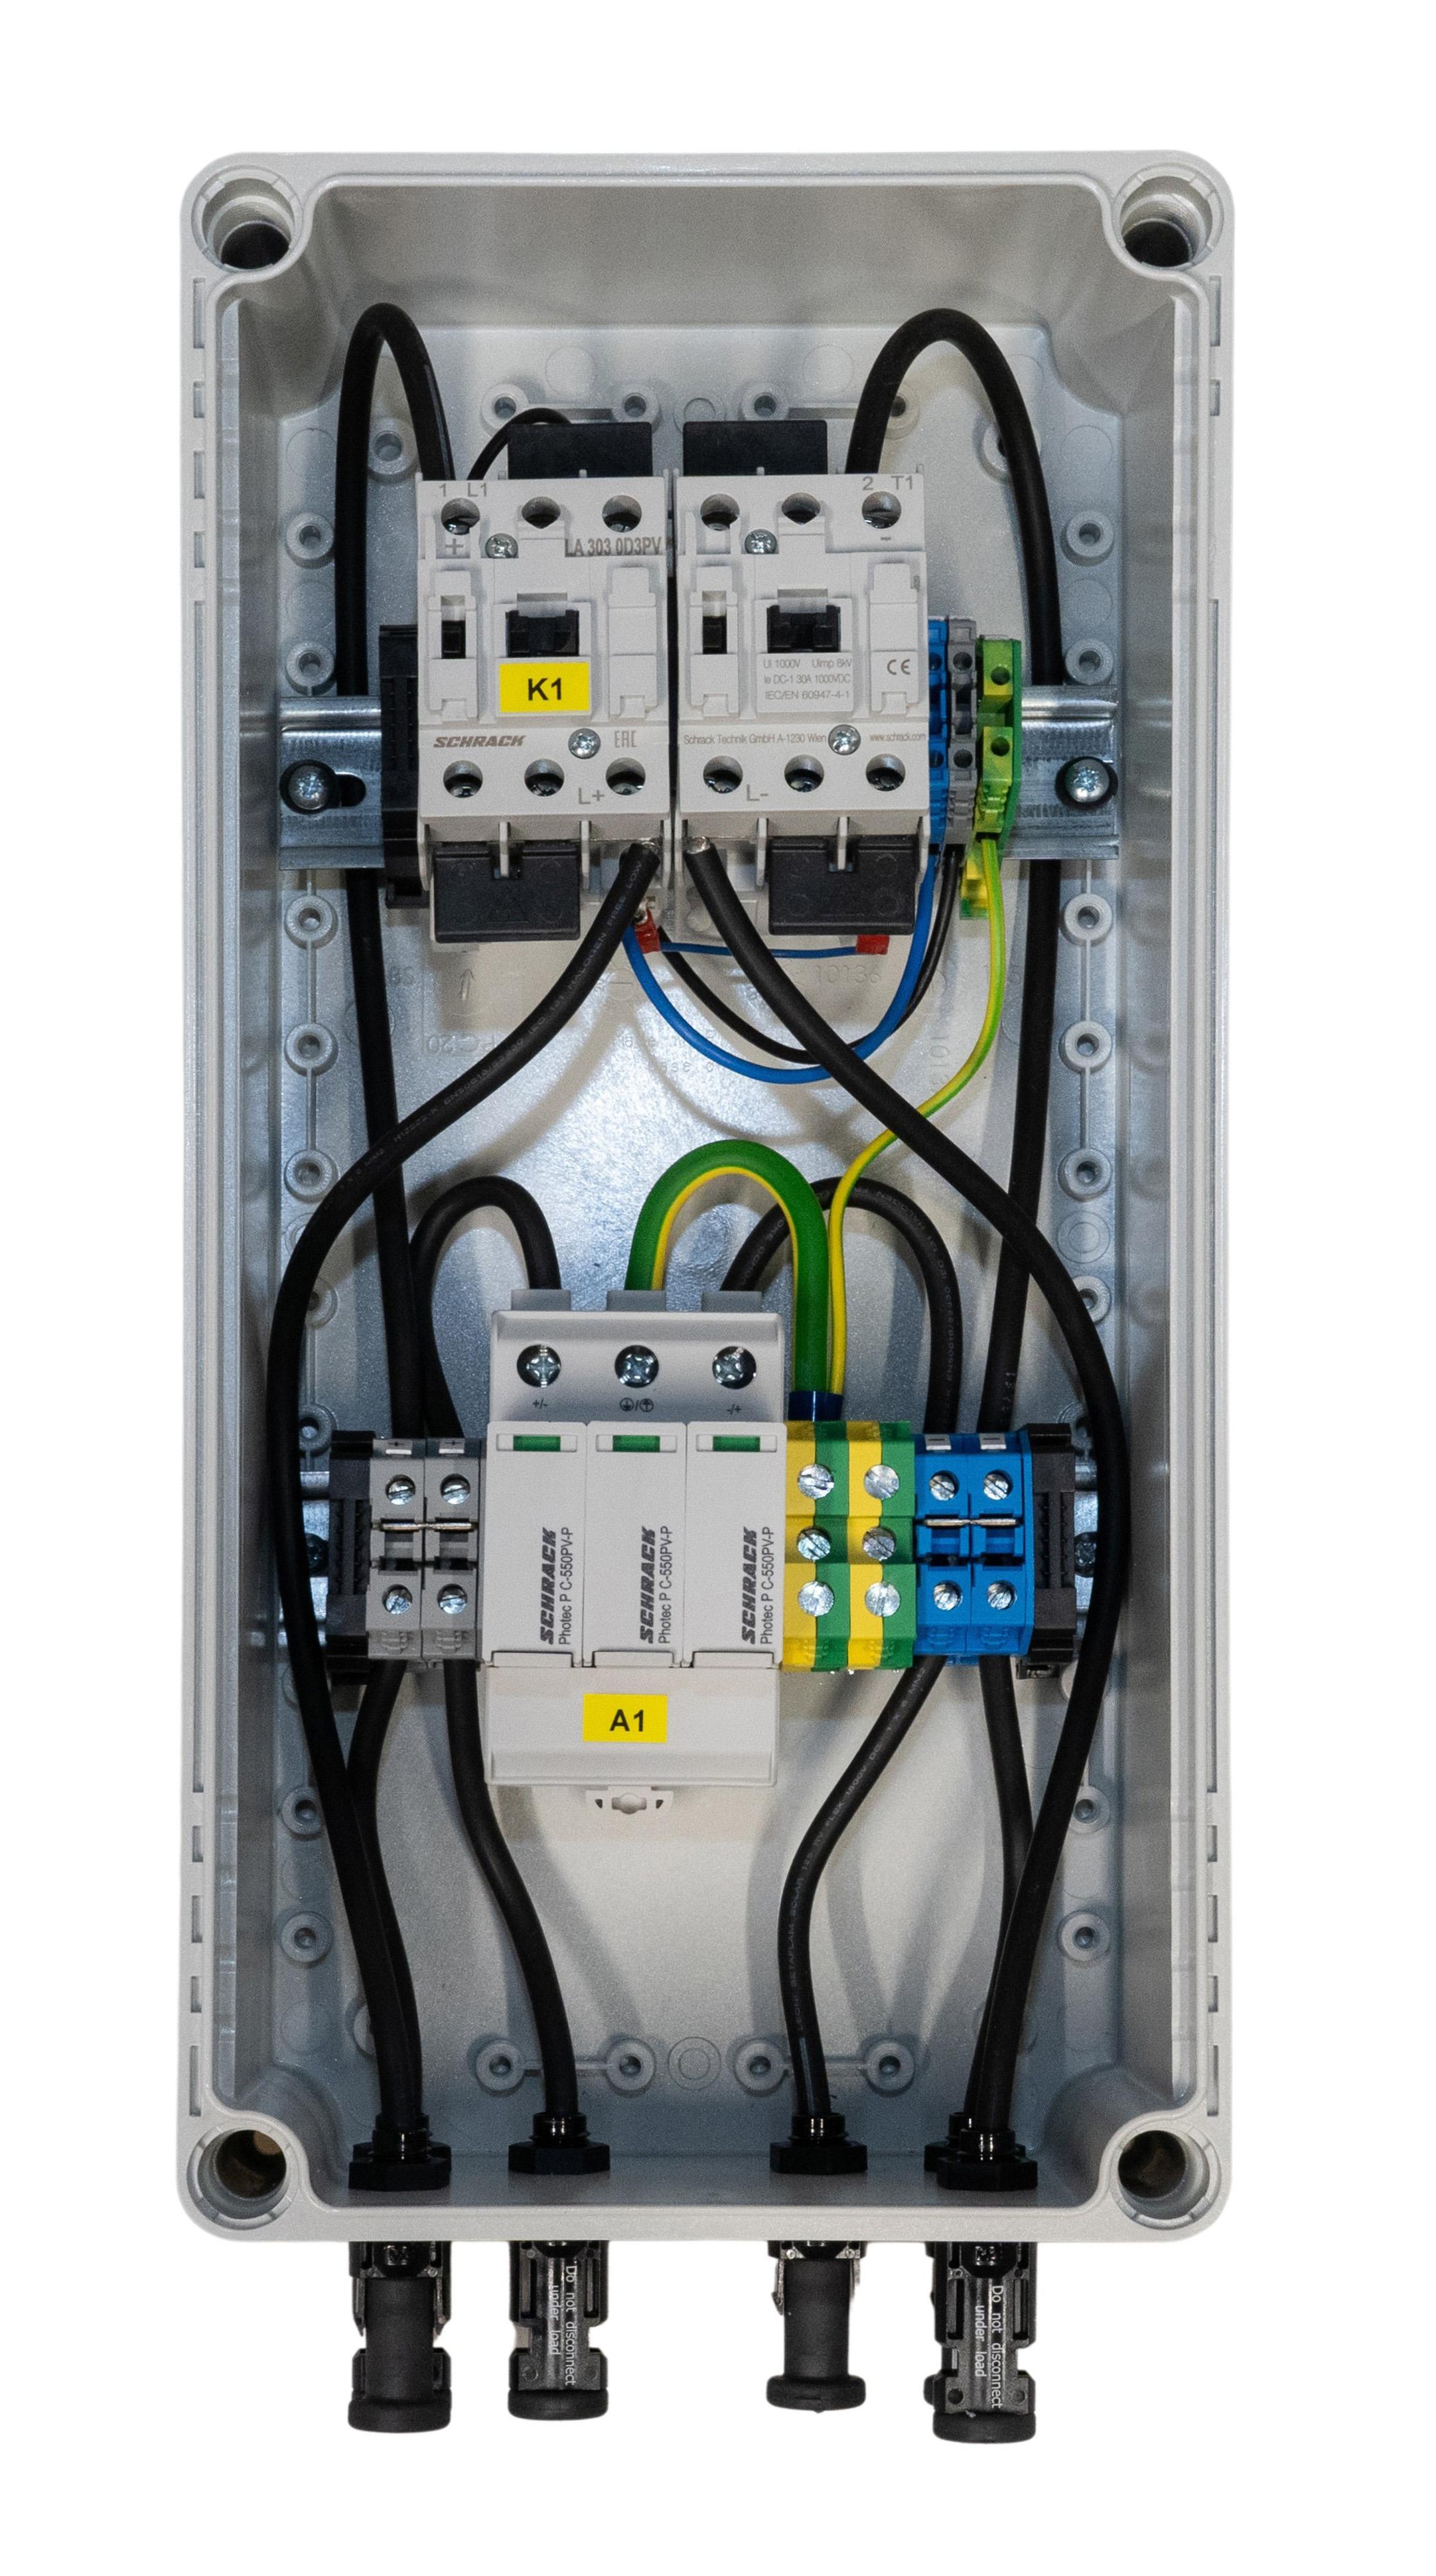 1 Stk PV-CombiBox C Ableiter+Brandschutz, 1 Mpp Tracker, 1000Vdc PVPF1501--